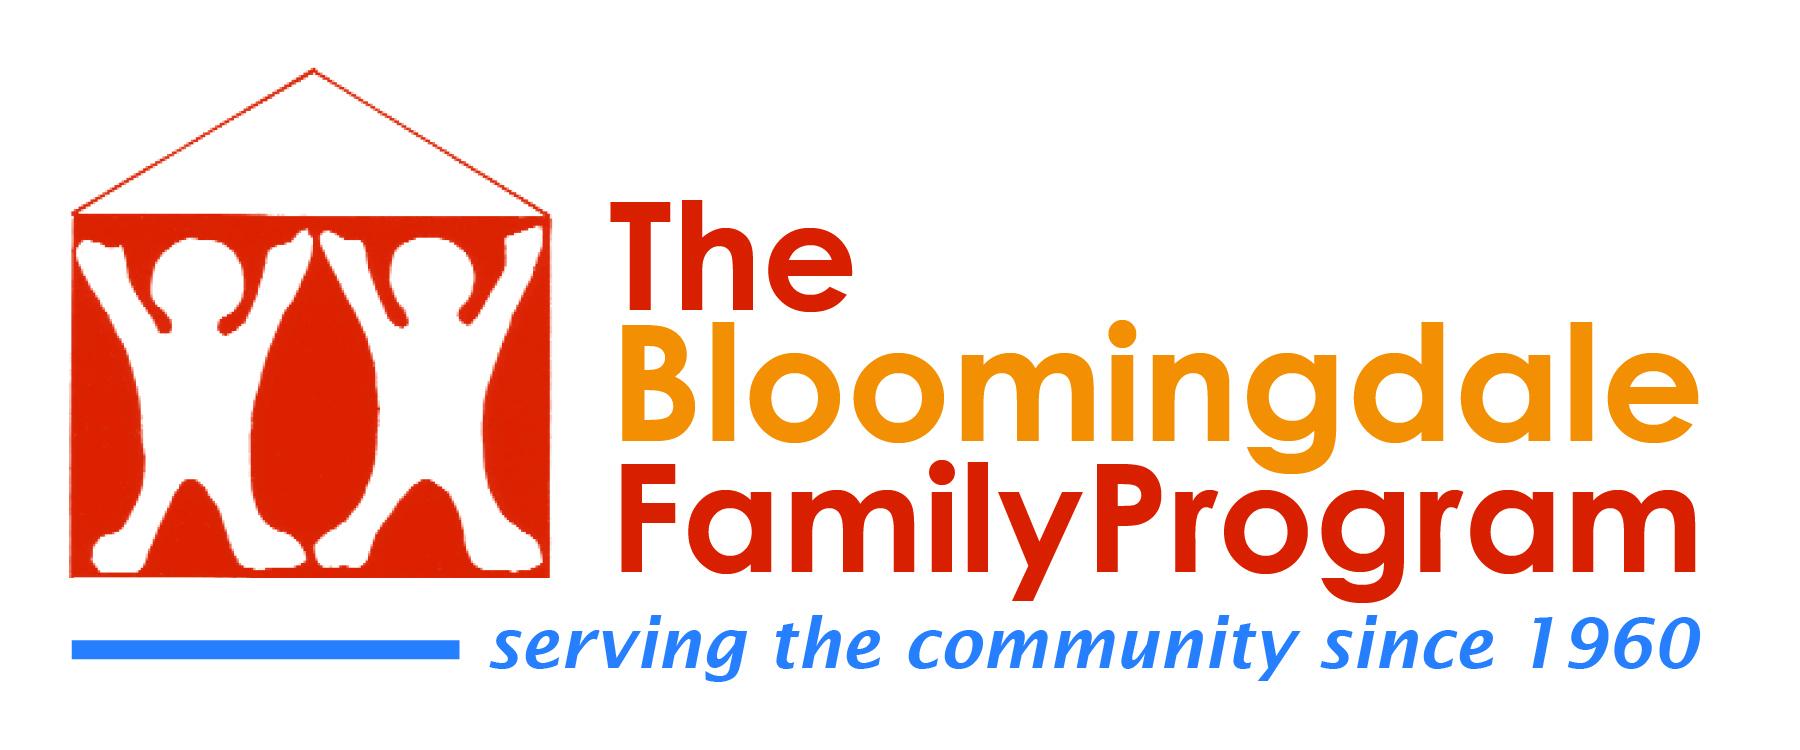 The Bloomingdale Family Program